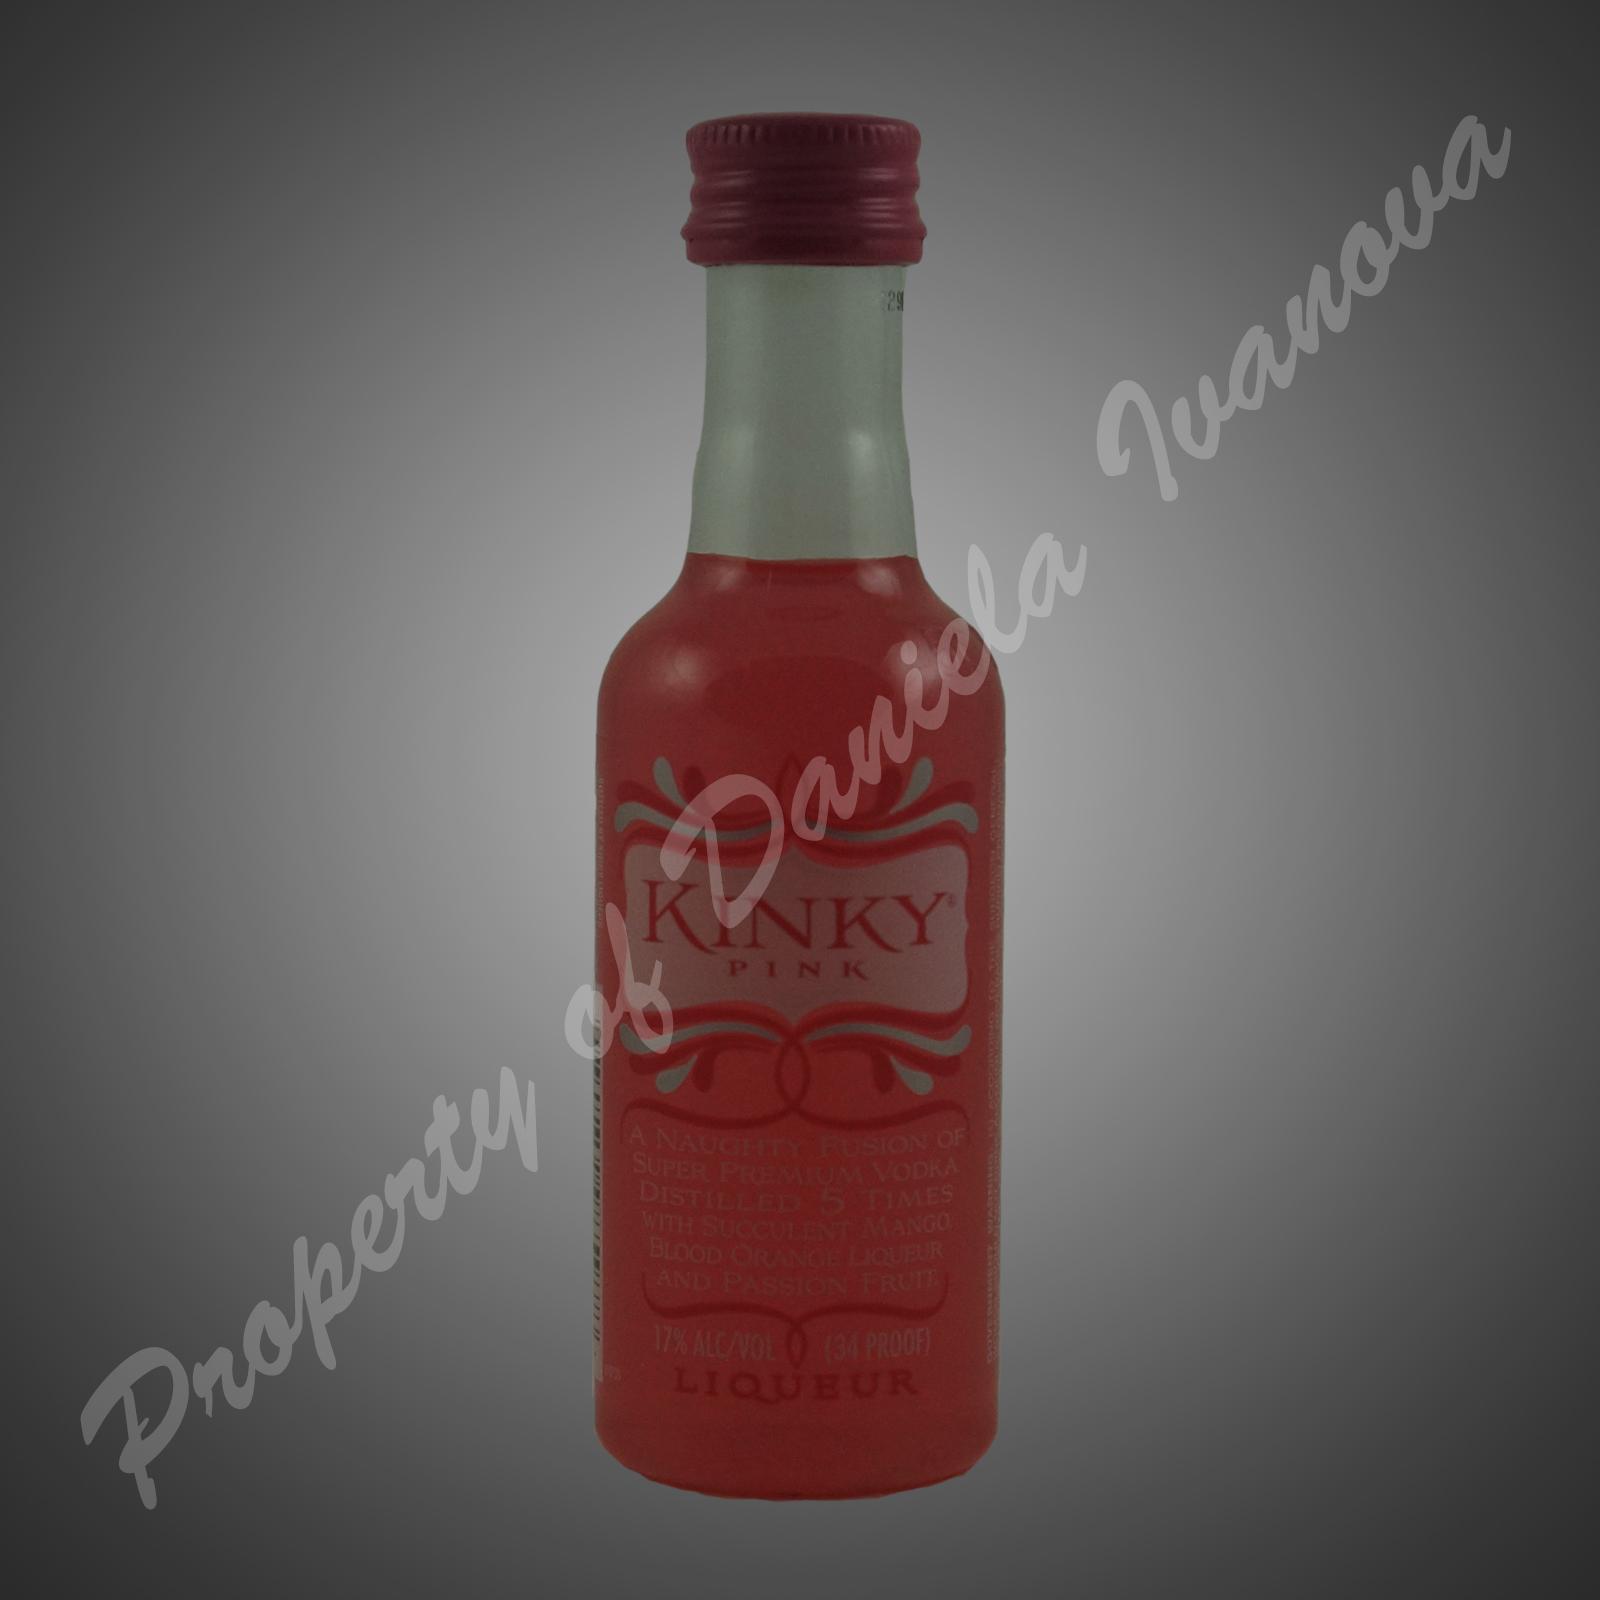 Kinky Pink Vodka